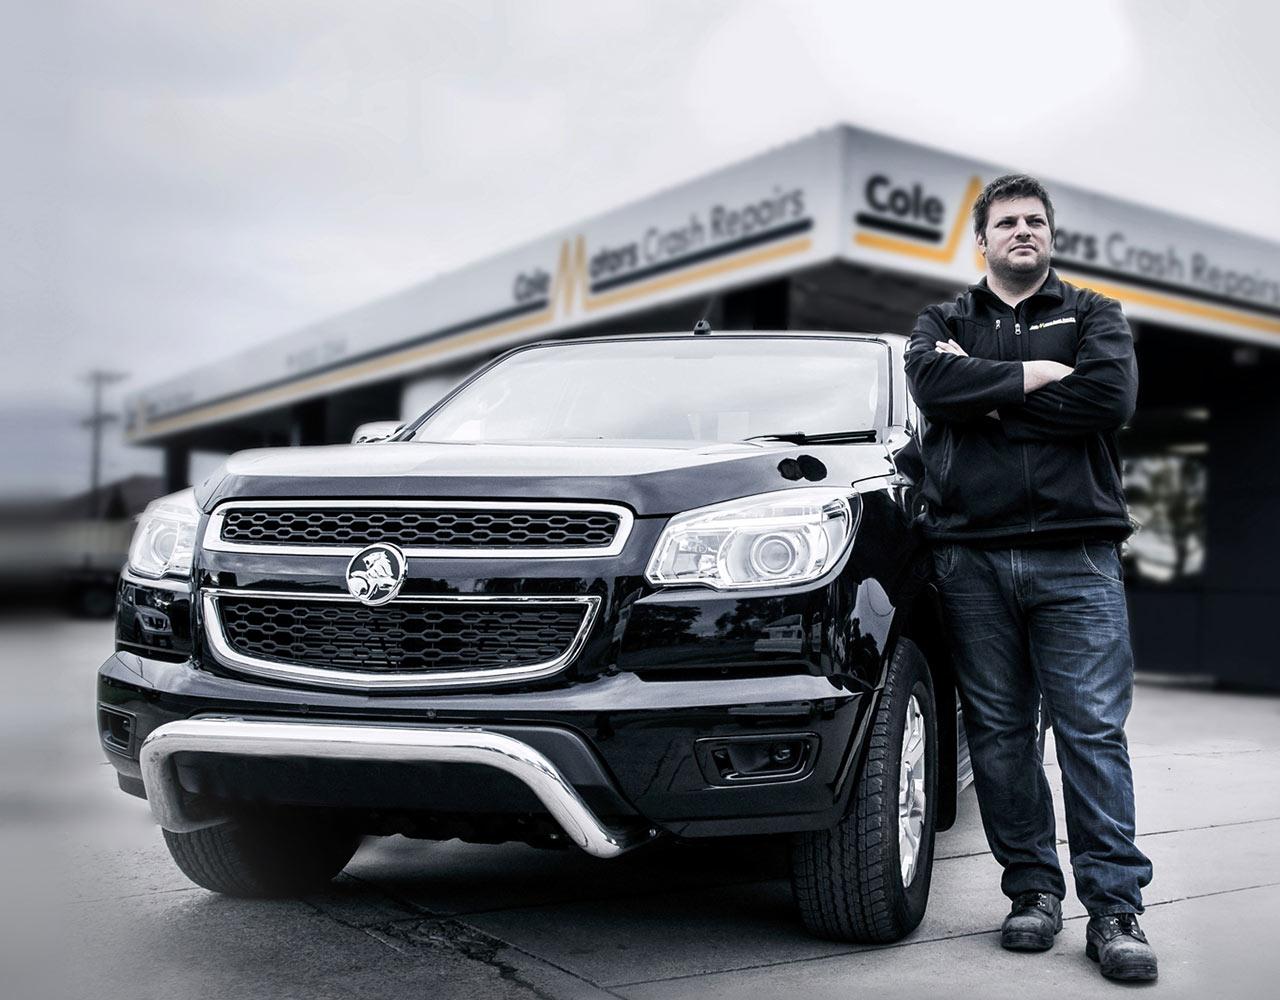 Cole Motors website